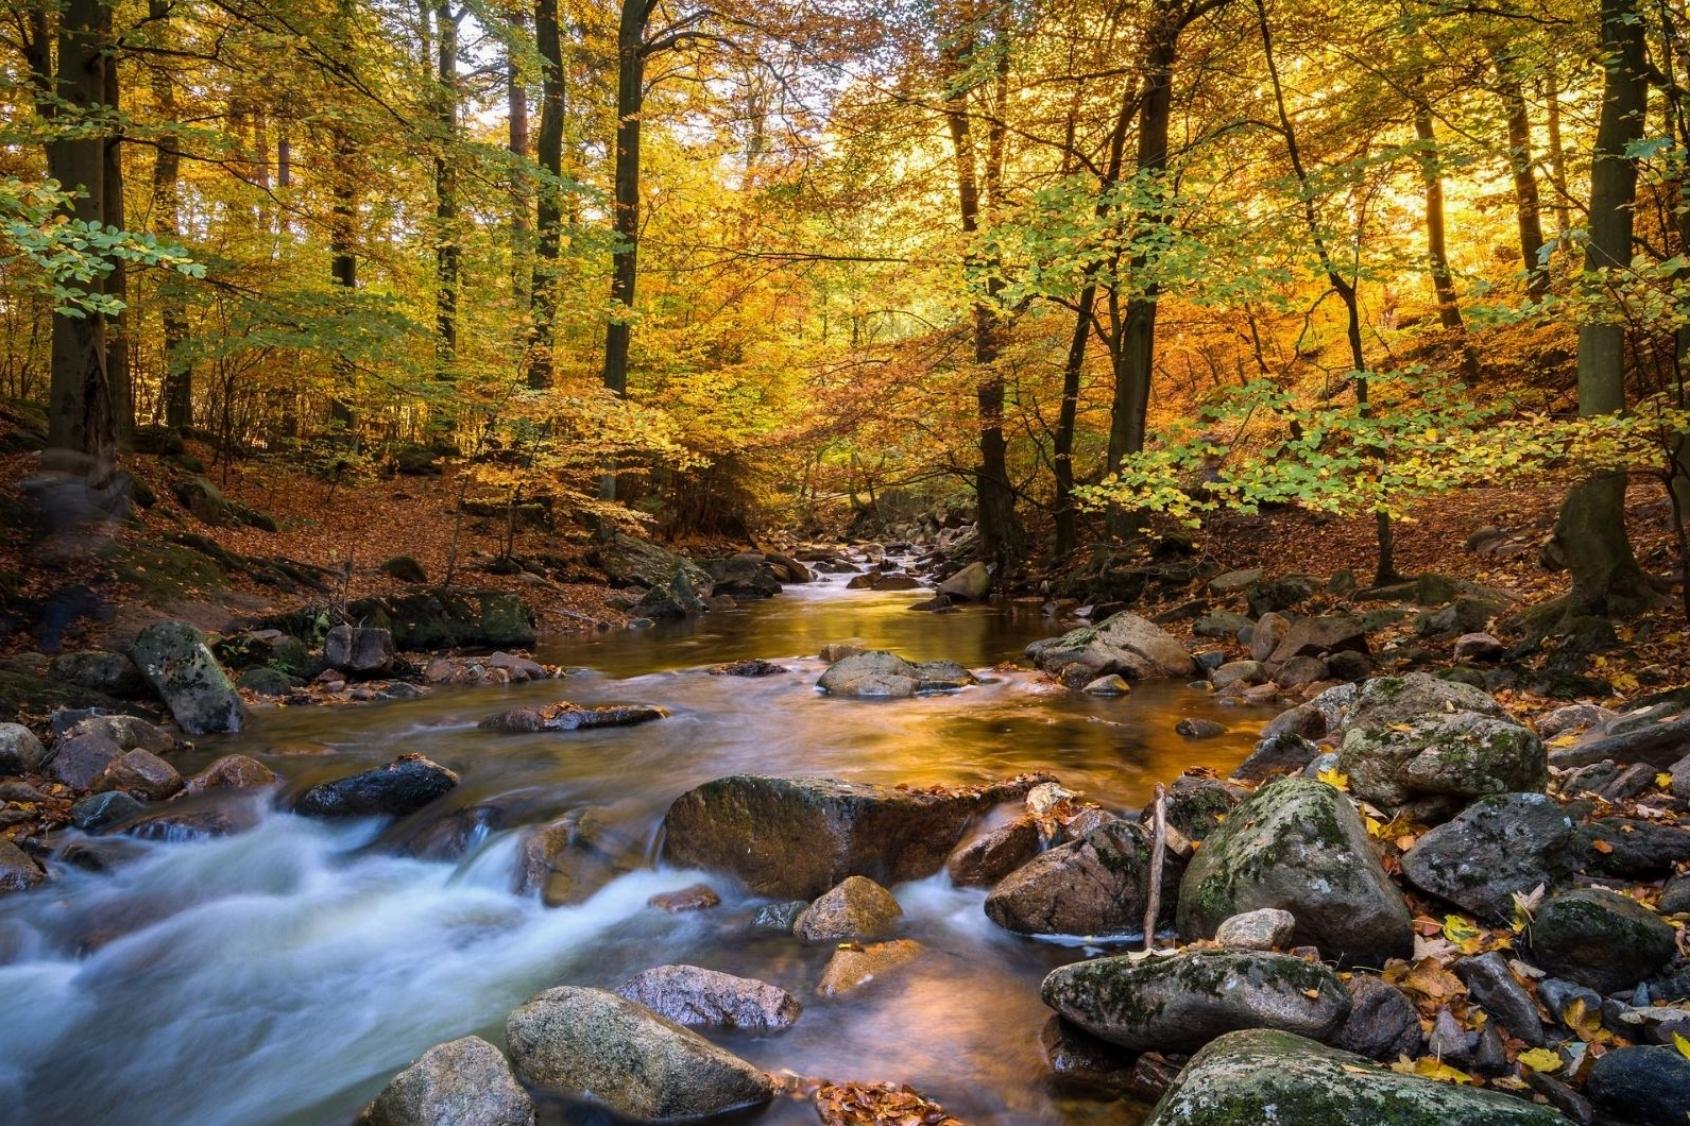 Lunchwandeling - Loslaten (het herfstbos als spiegel) - Delftse Hout - EXTRA WANDELING